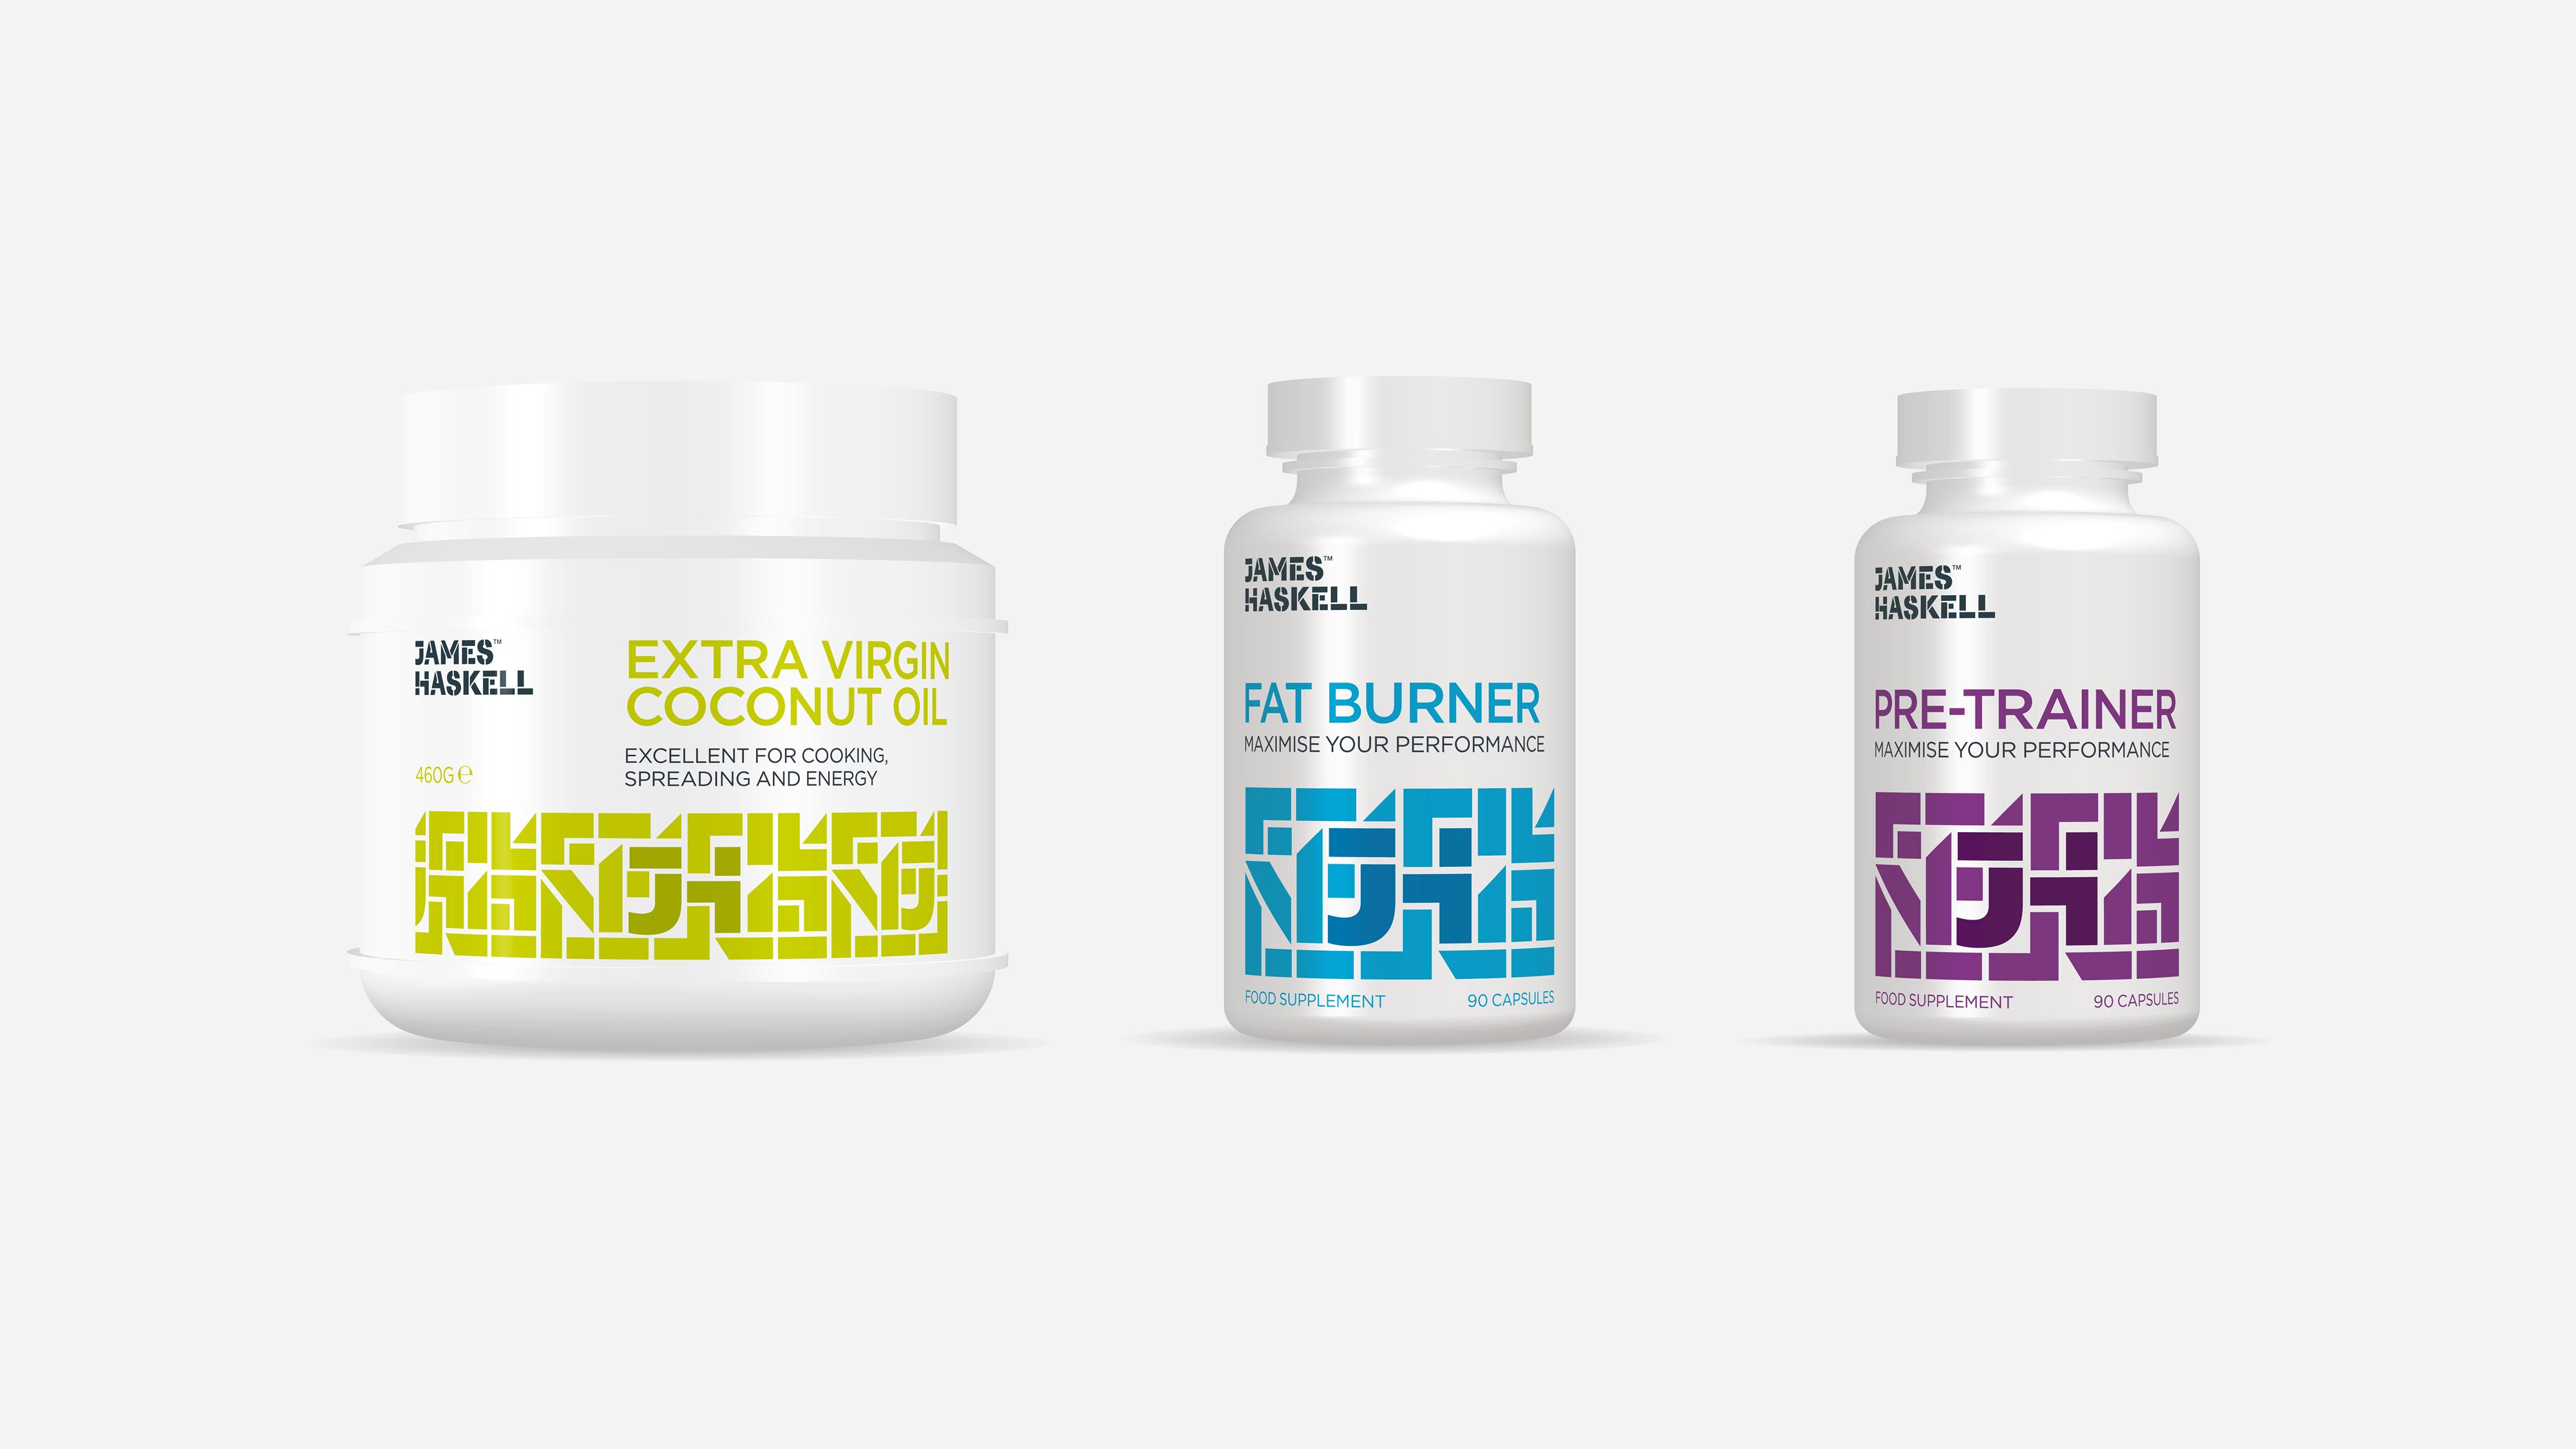 Consumer Product Pack Design